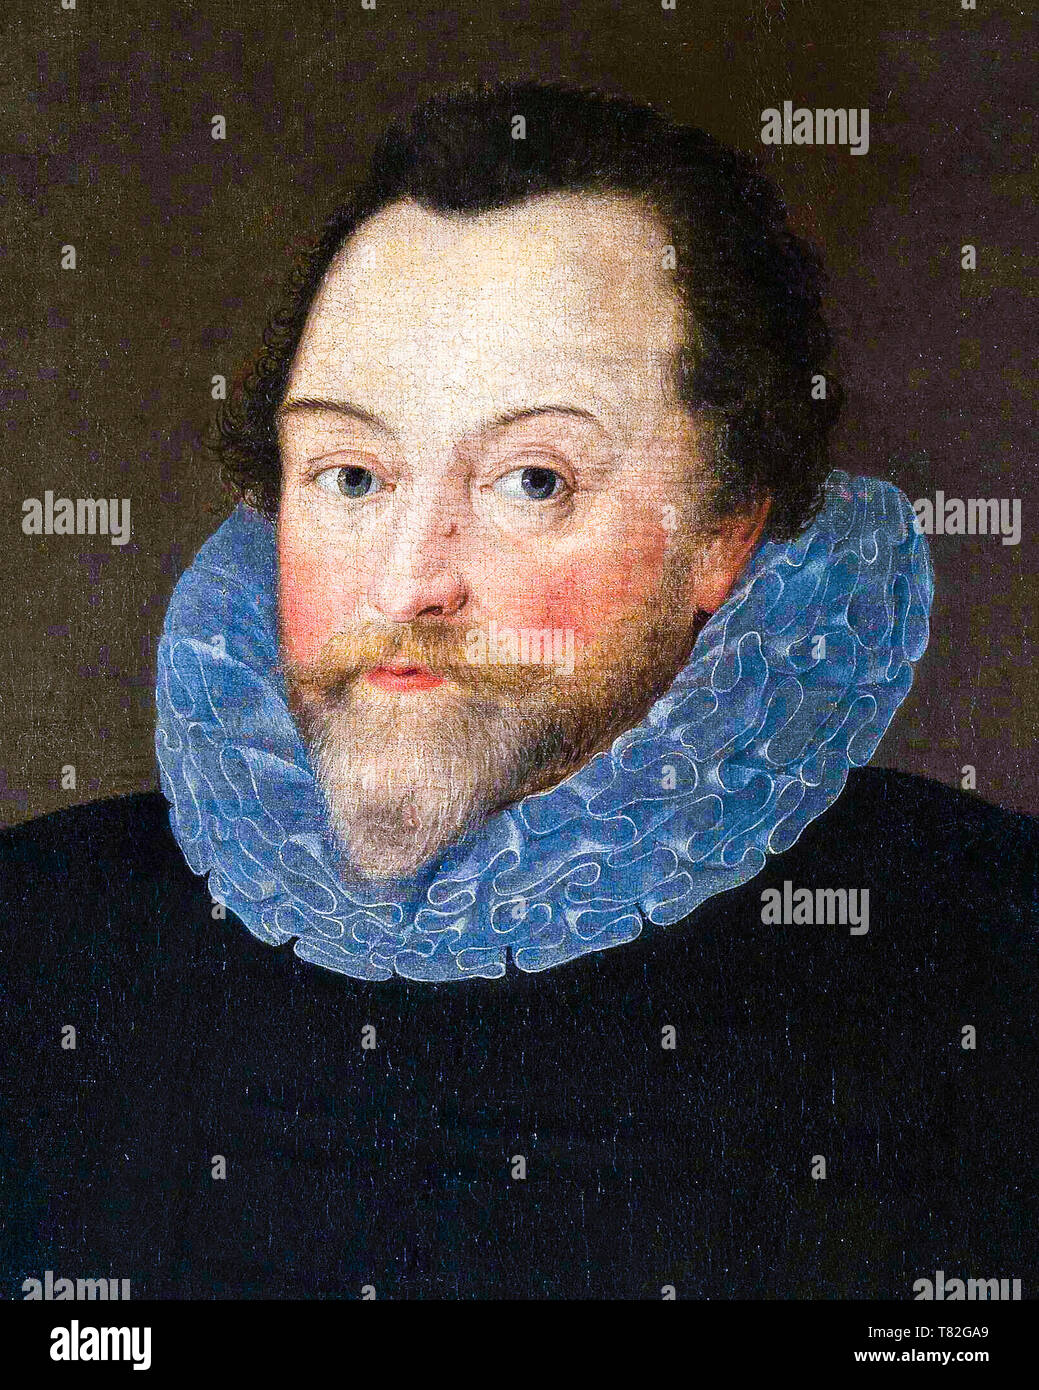 Sir Francis Drake, portrait painting (detail) 1591 - Stock Image